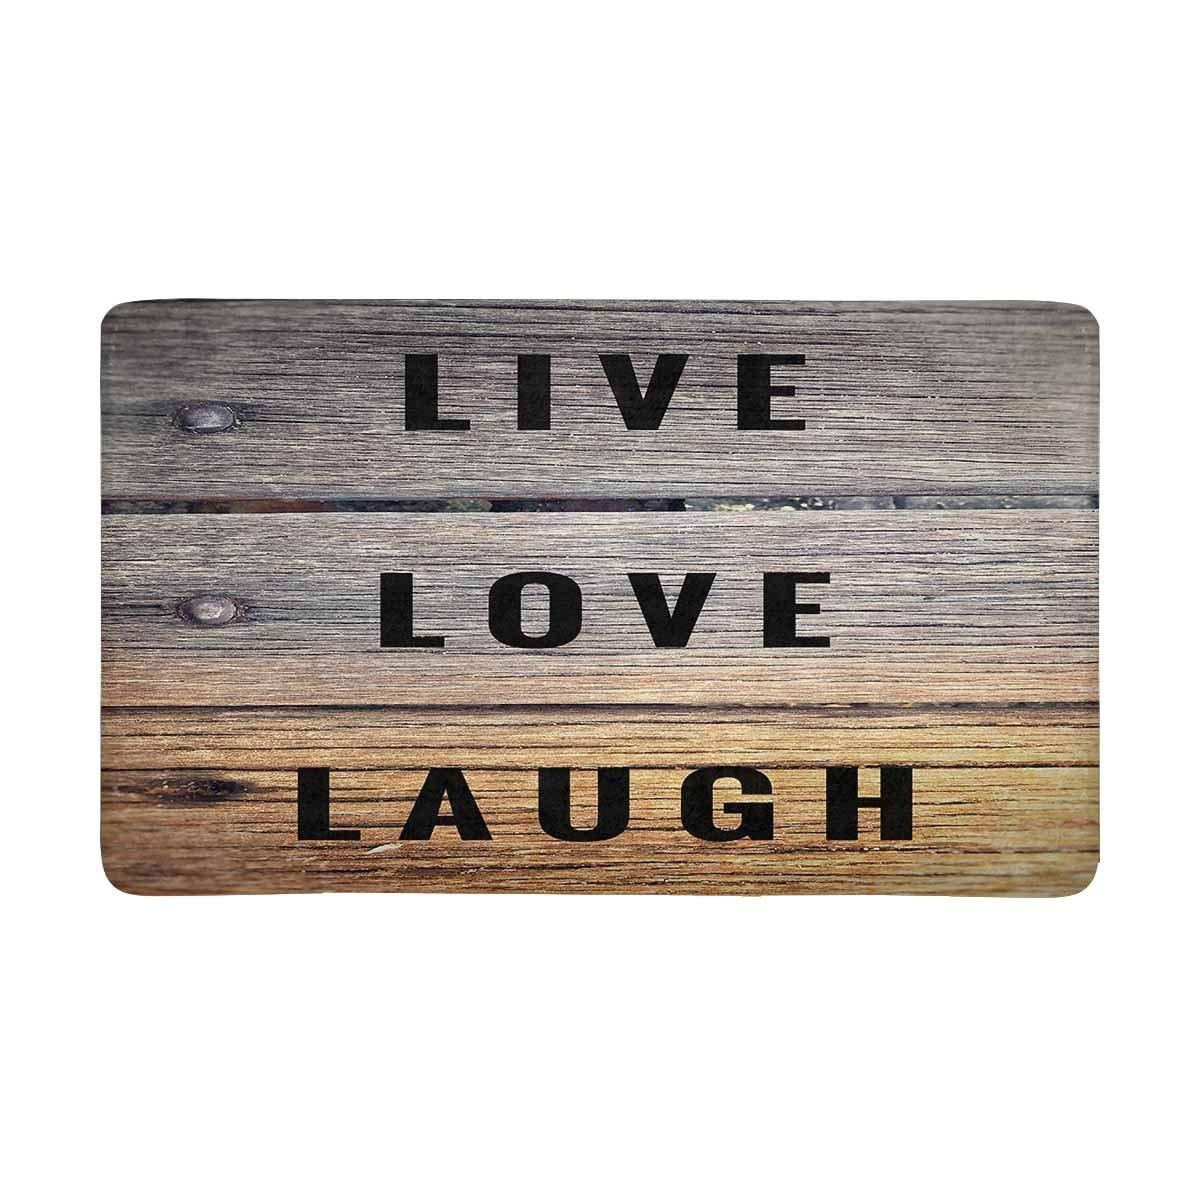 "InterestPrint Motivational and Inspirational Quotes Live Love Laugh Doormat Indoor Outdoor Entrance Rug Floor Mats Door Mat Non-Slip Home Decor, Rubber Backing Large 30""(L) x 18""(W)"